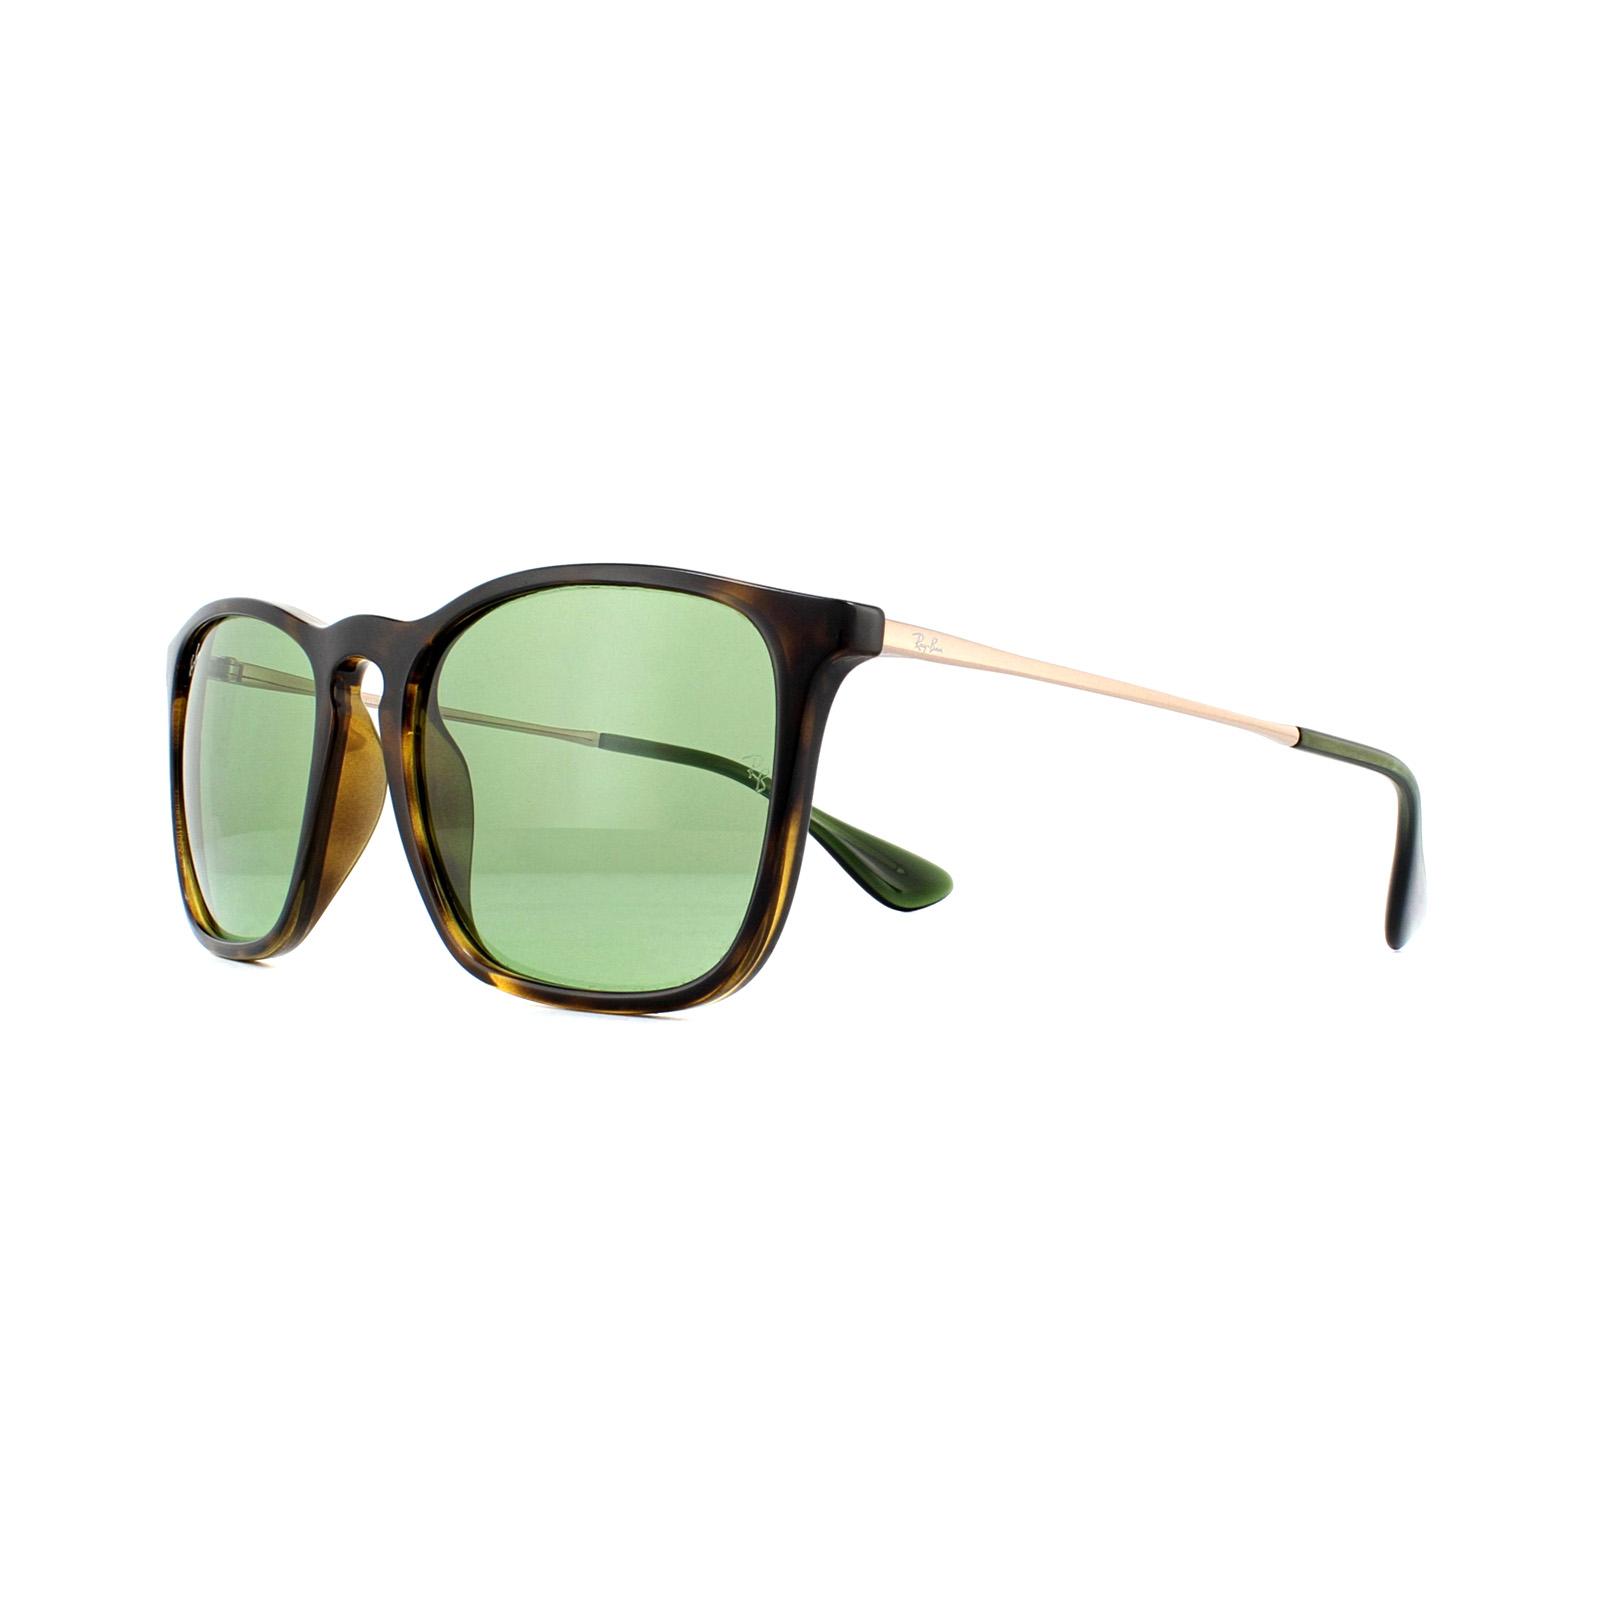 35f0524c358 Ray-Ban Sunglasses Chris 4187 6393 2 Havana Green 8053672977240